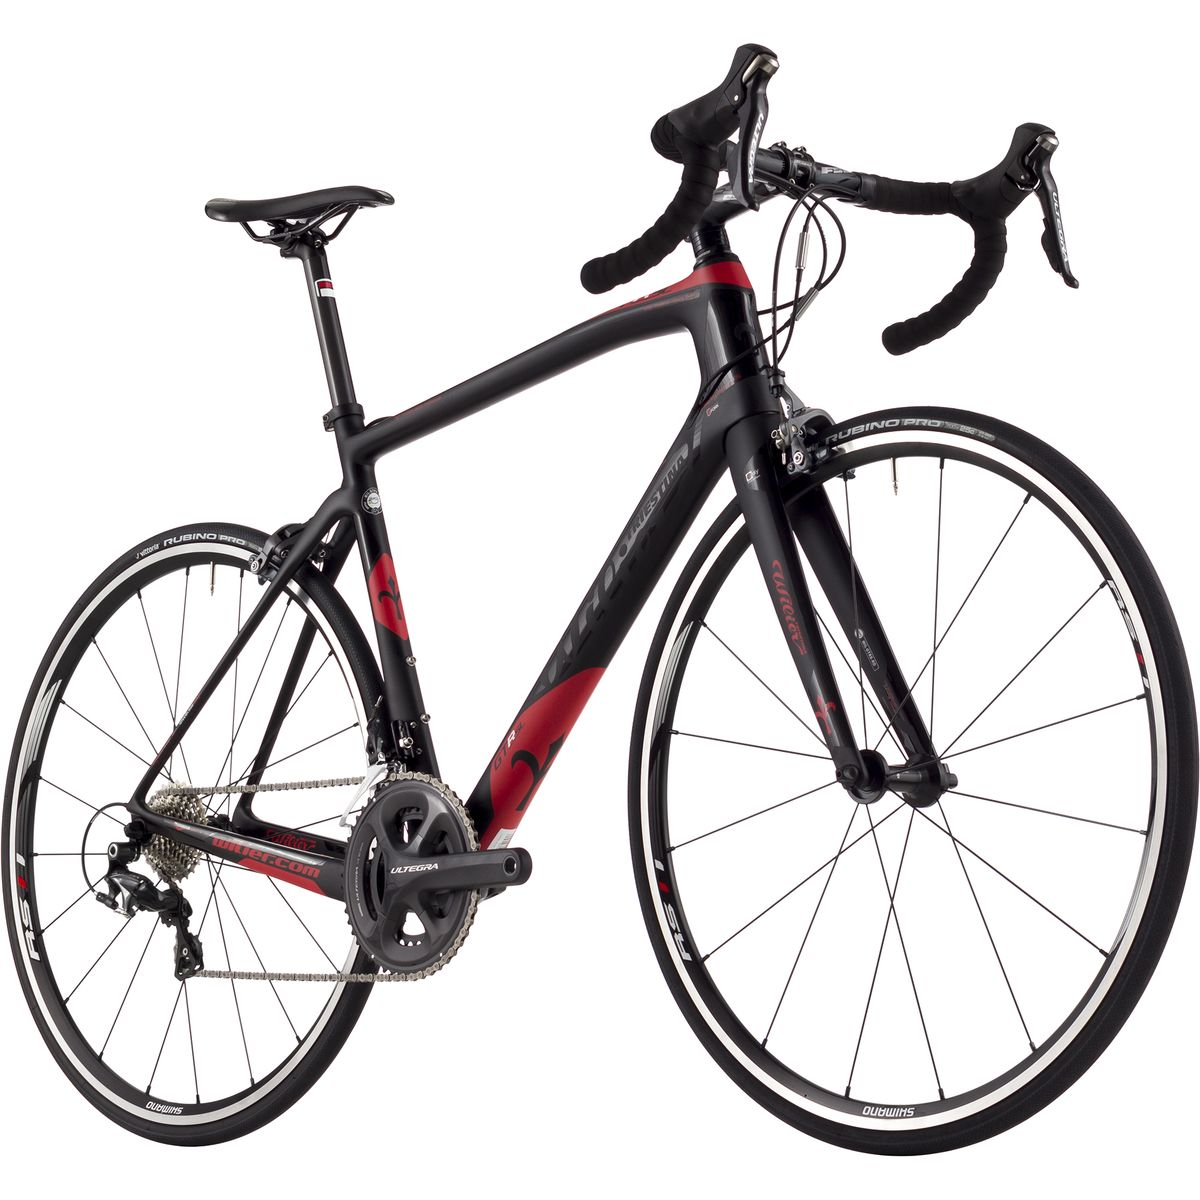 wilier gtr sl ultegra complete road bike 2016 competitive cyclist. Black Bedroom Furniture Sets. Home Design Ideas